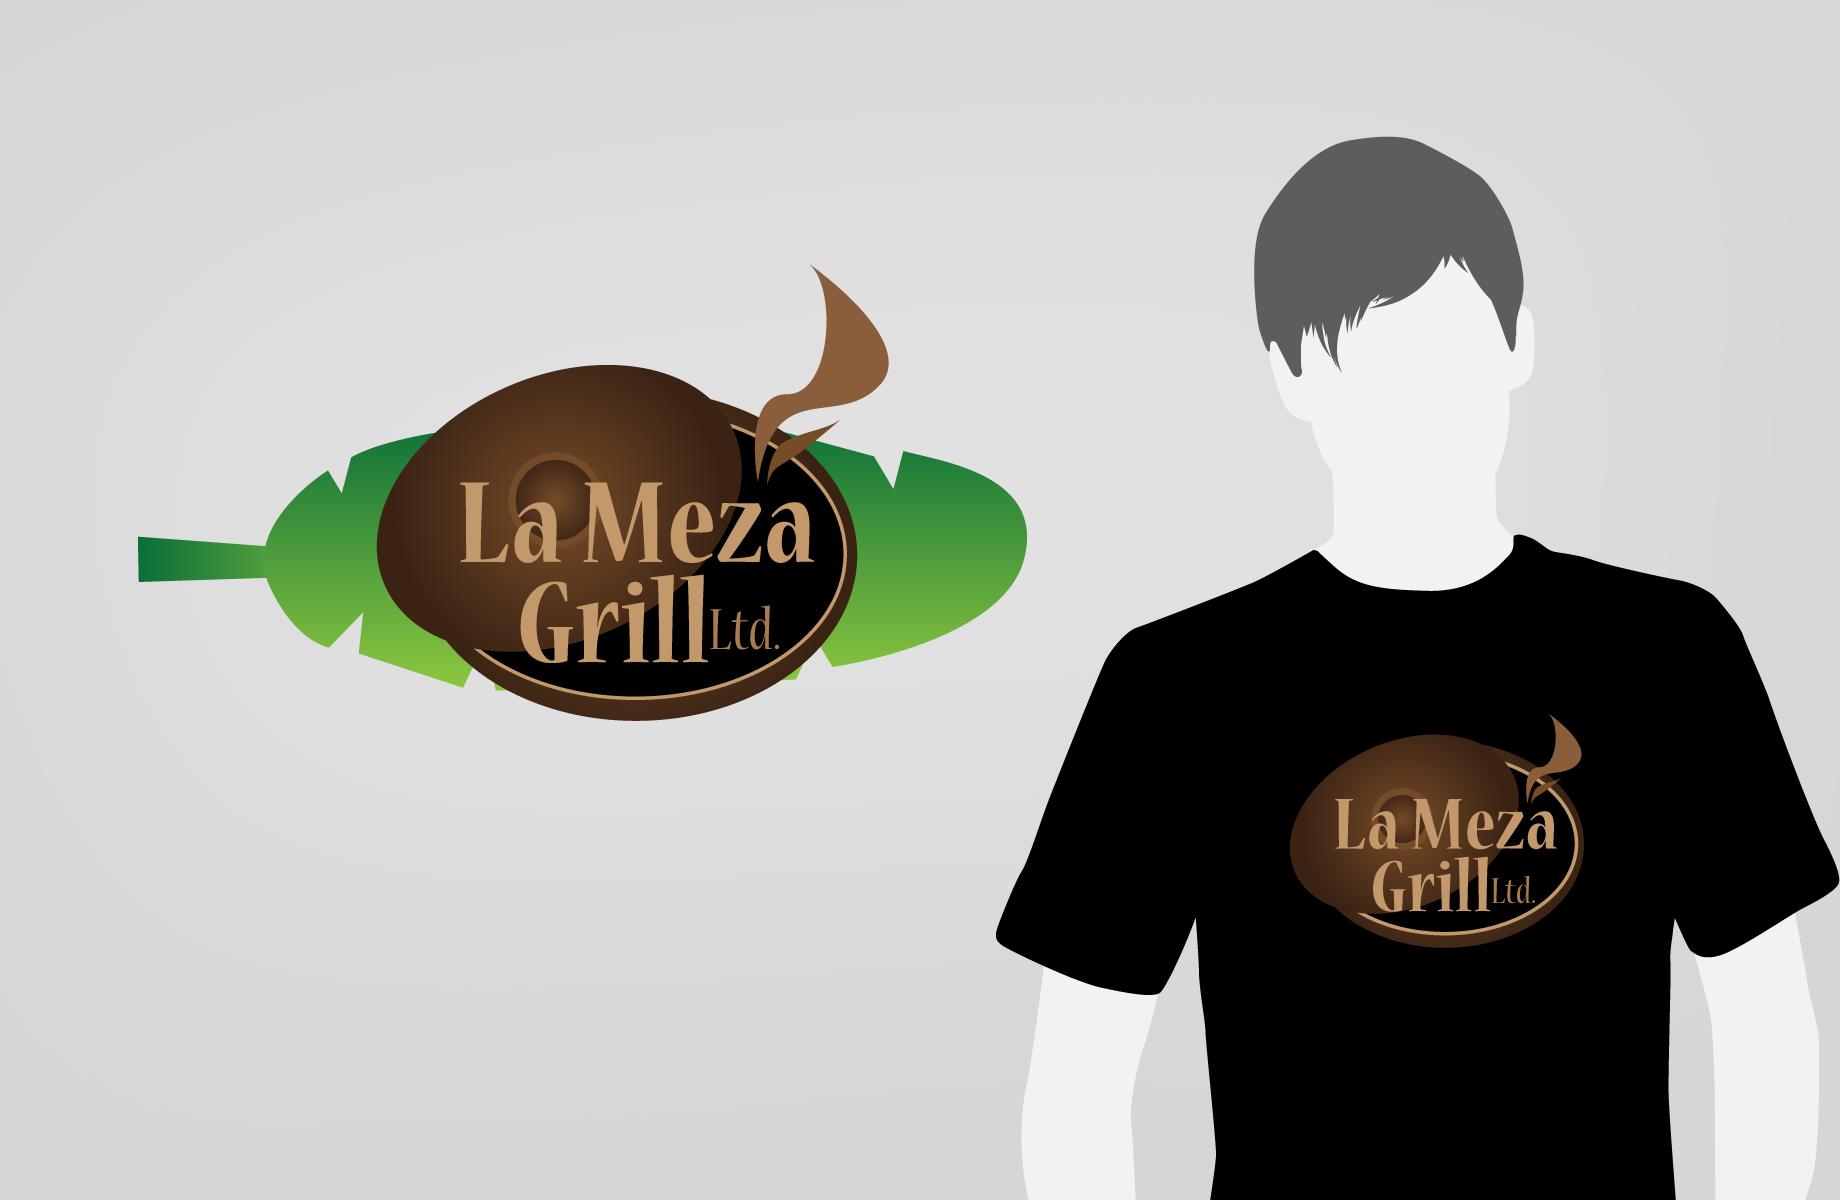 Logo Design by Jan Chua - Entry No. 51 in the Logo Design Contest Inspiring Logo Design for La Meza Grill Ltd..